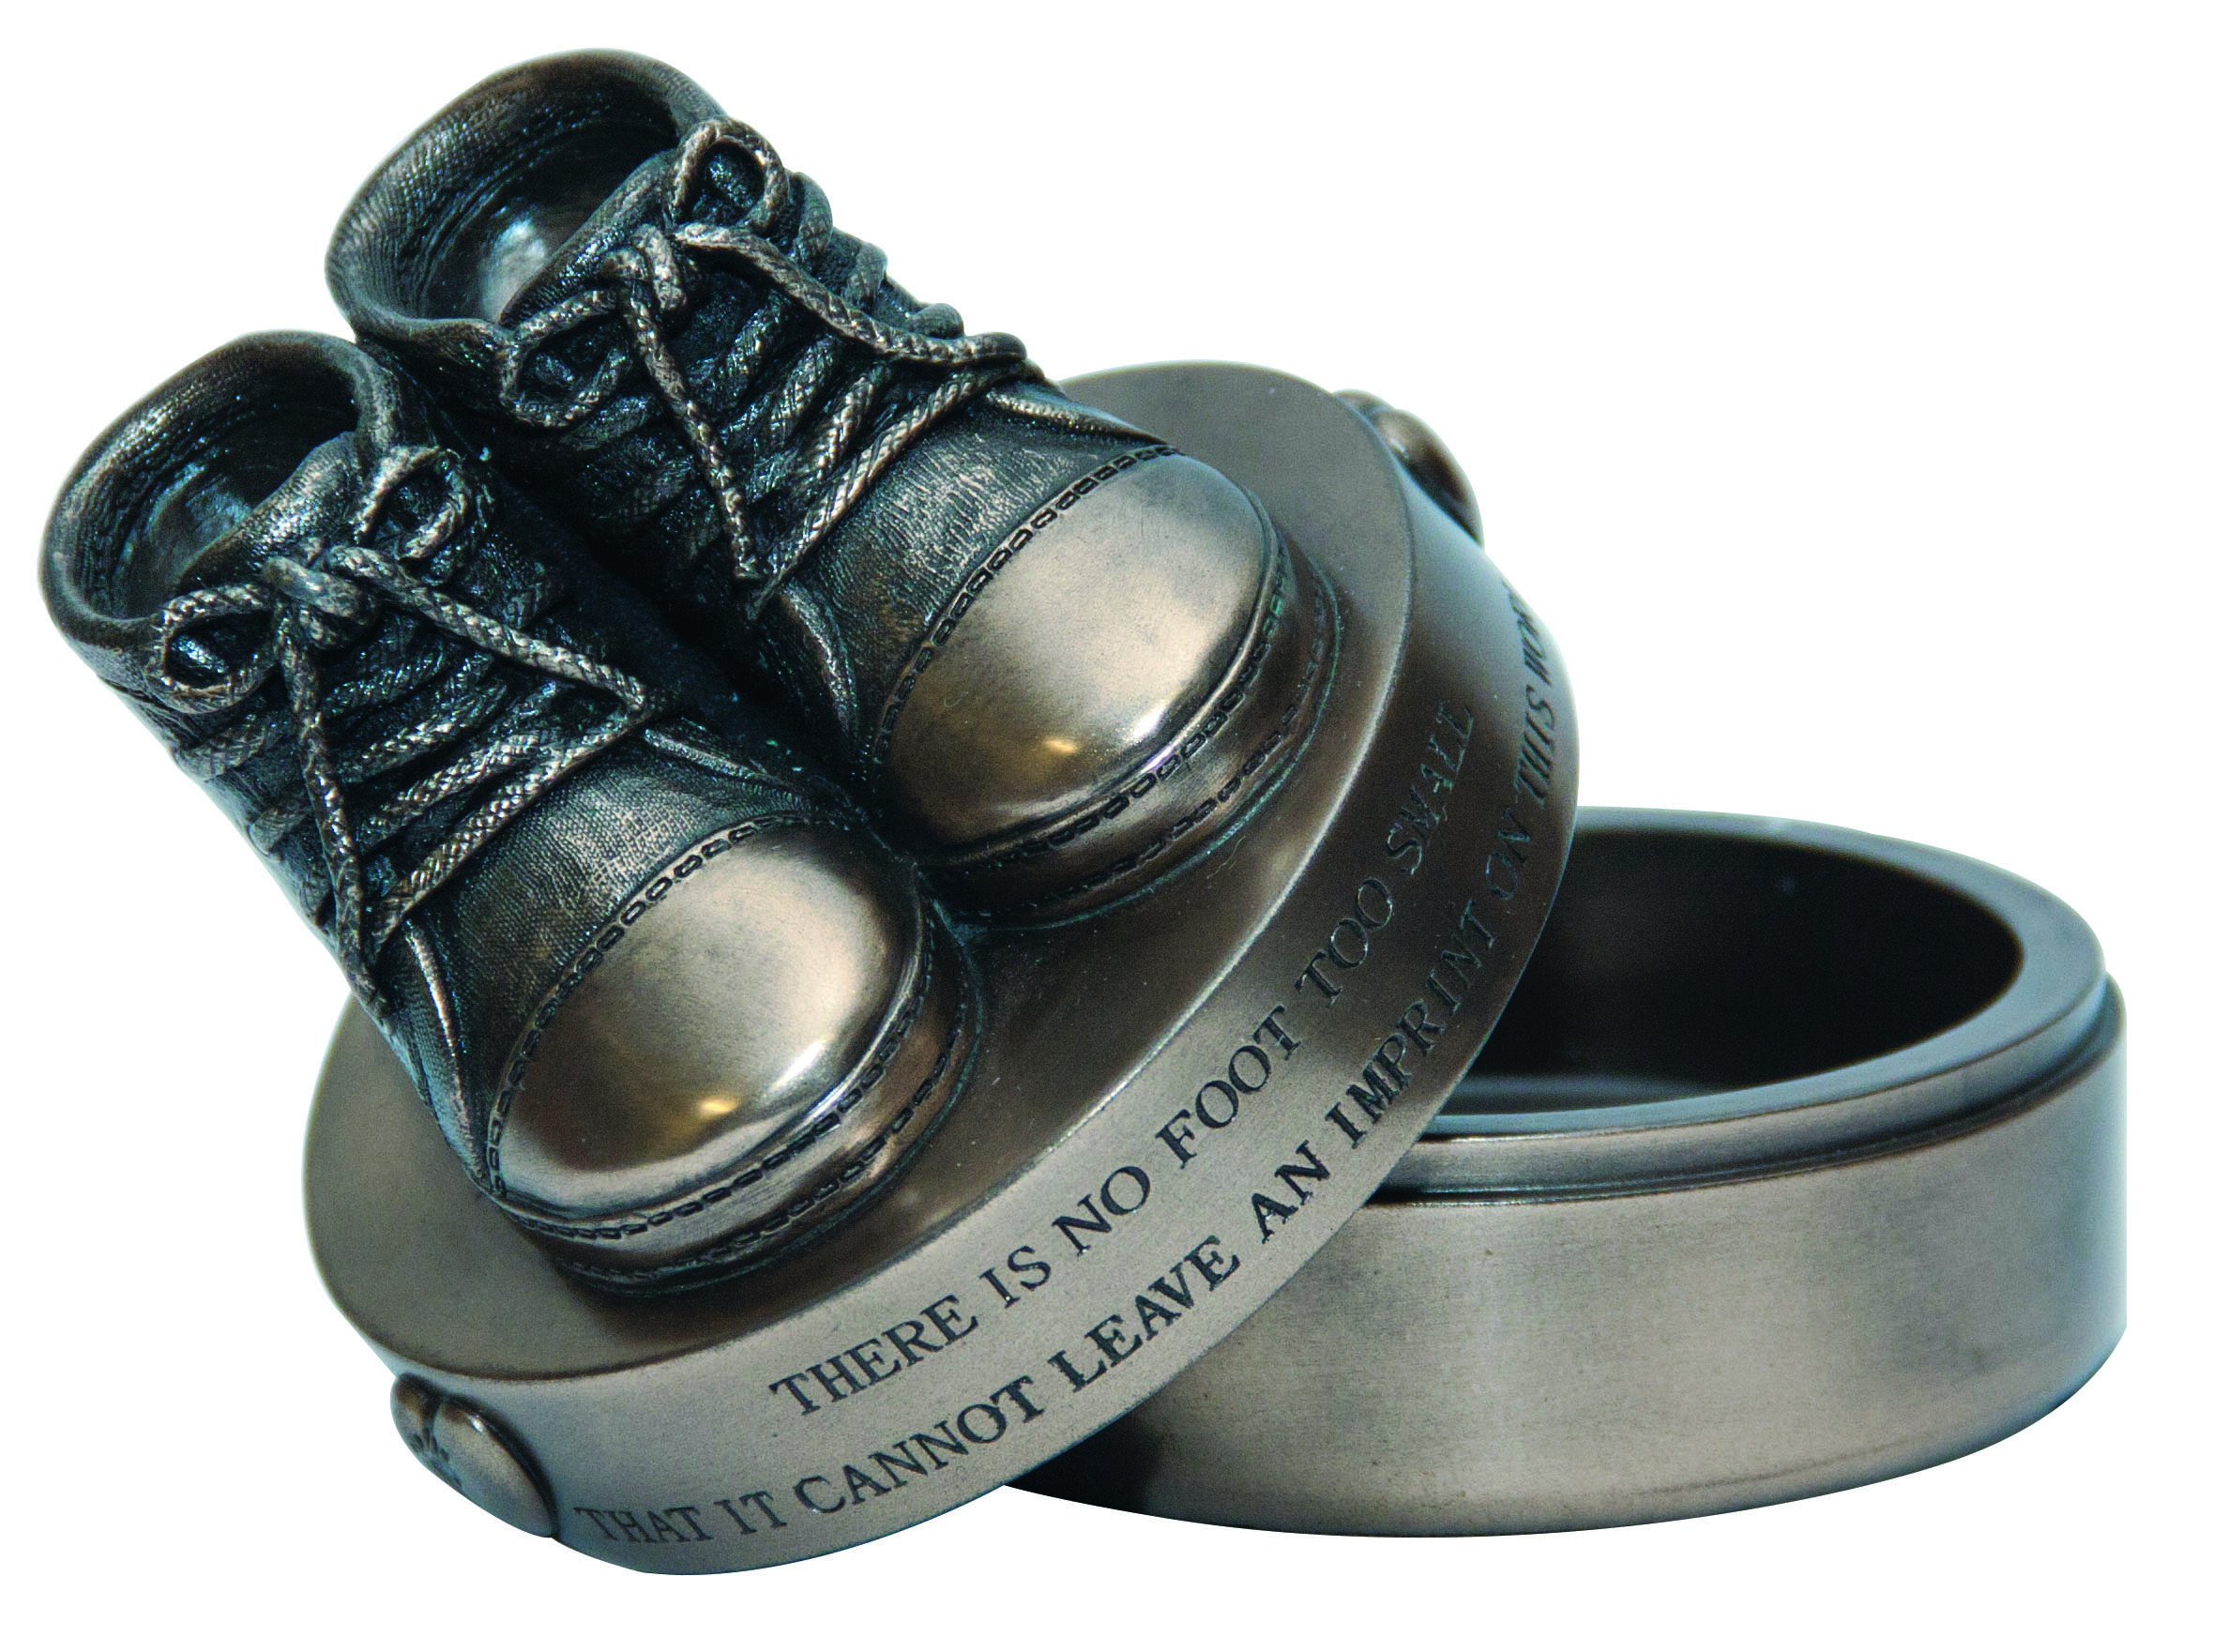 Genesis Baby Boy Booties - Frank Roche & Sons Ltd